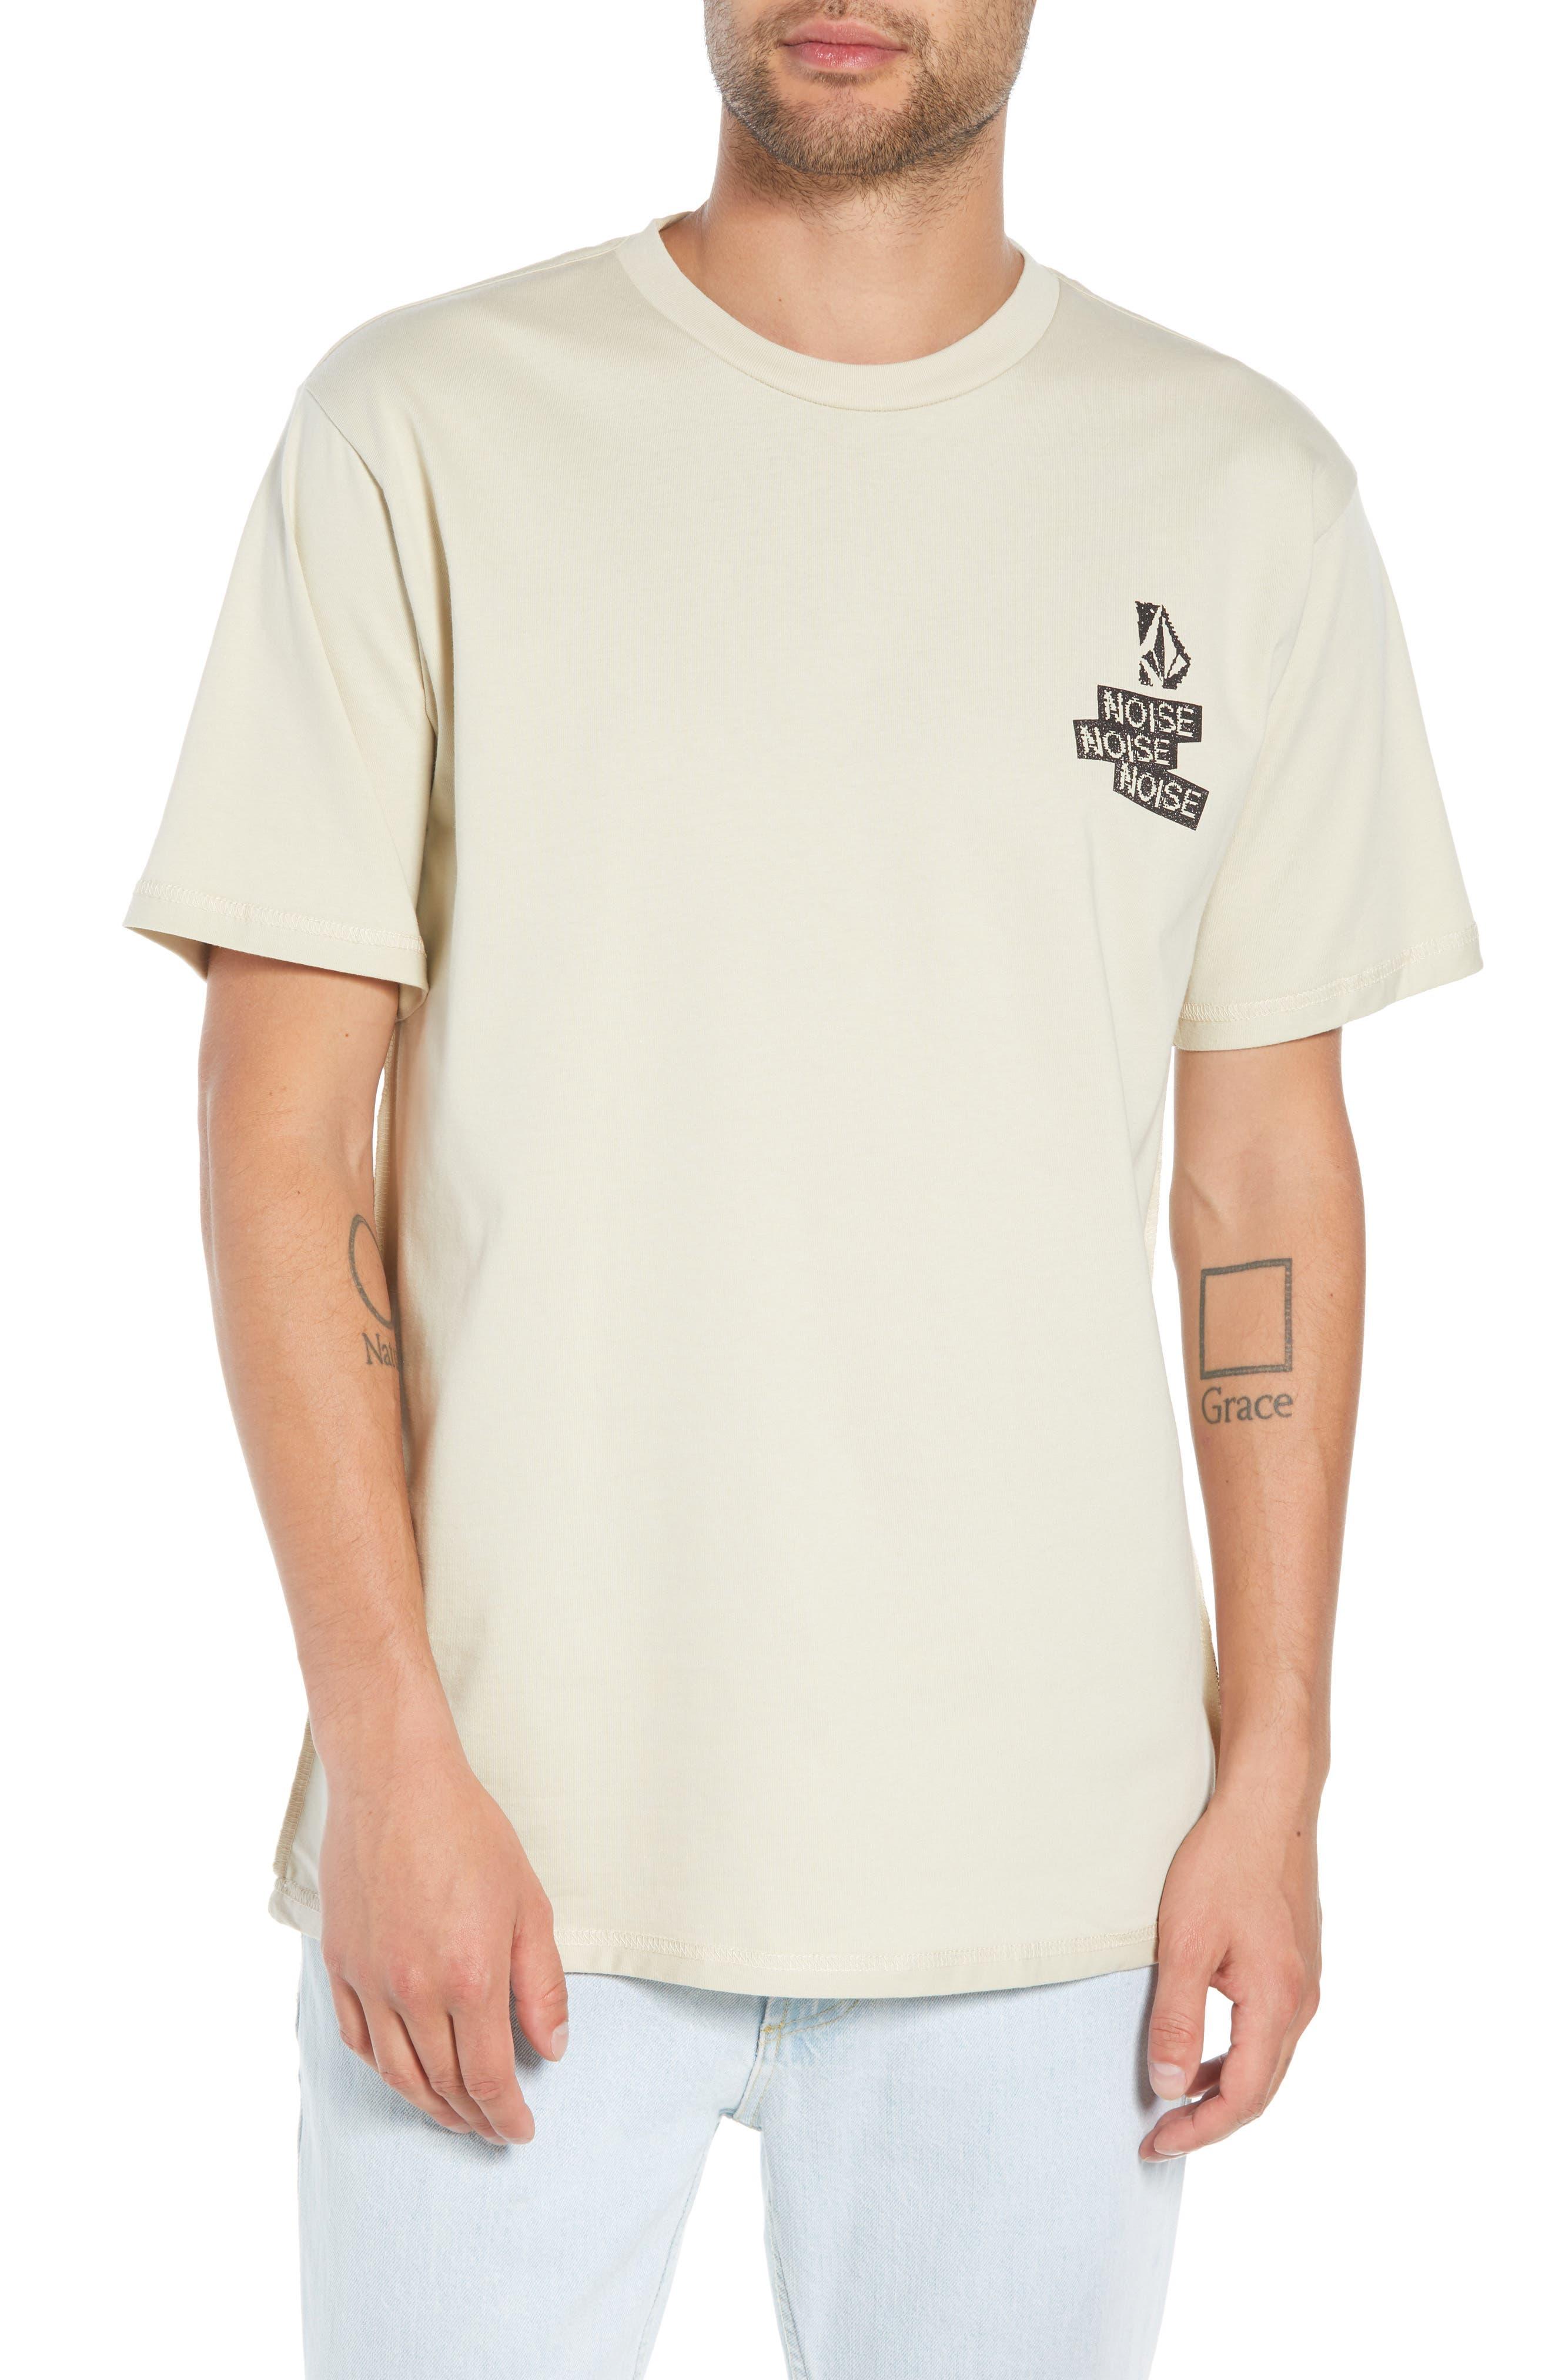 Noa Noise Graphic T-Shirt,                             Main thumbnail 1, color,                             283